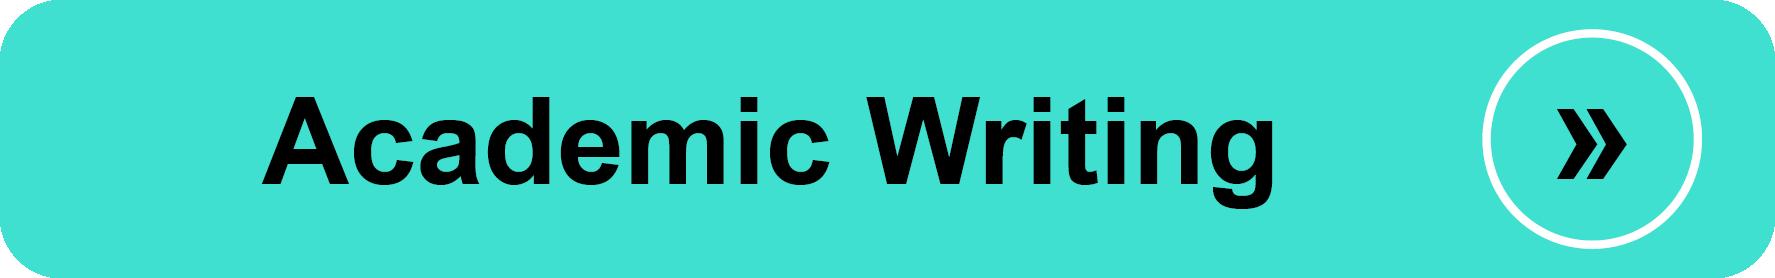 Academic Writing Checkin